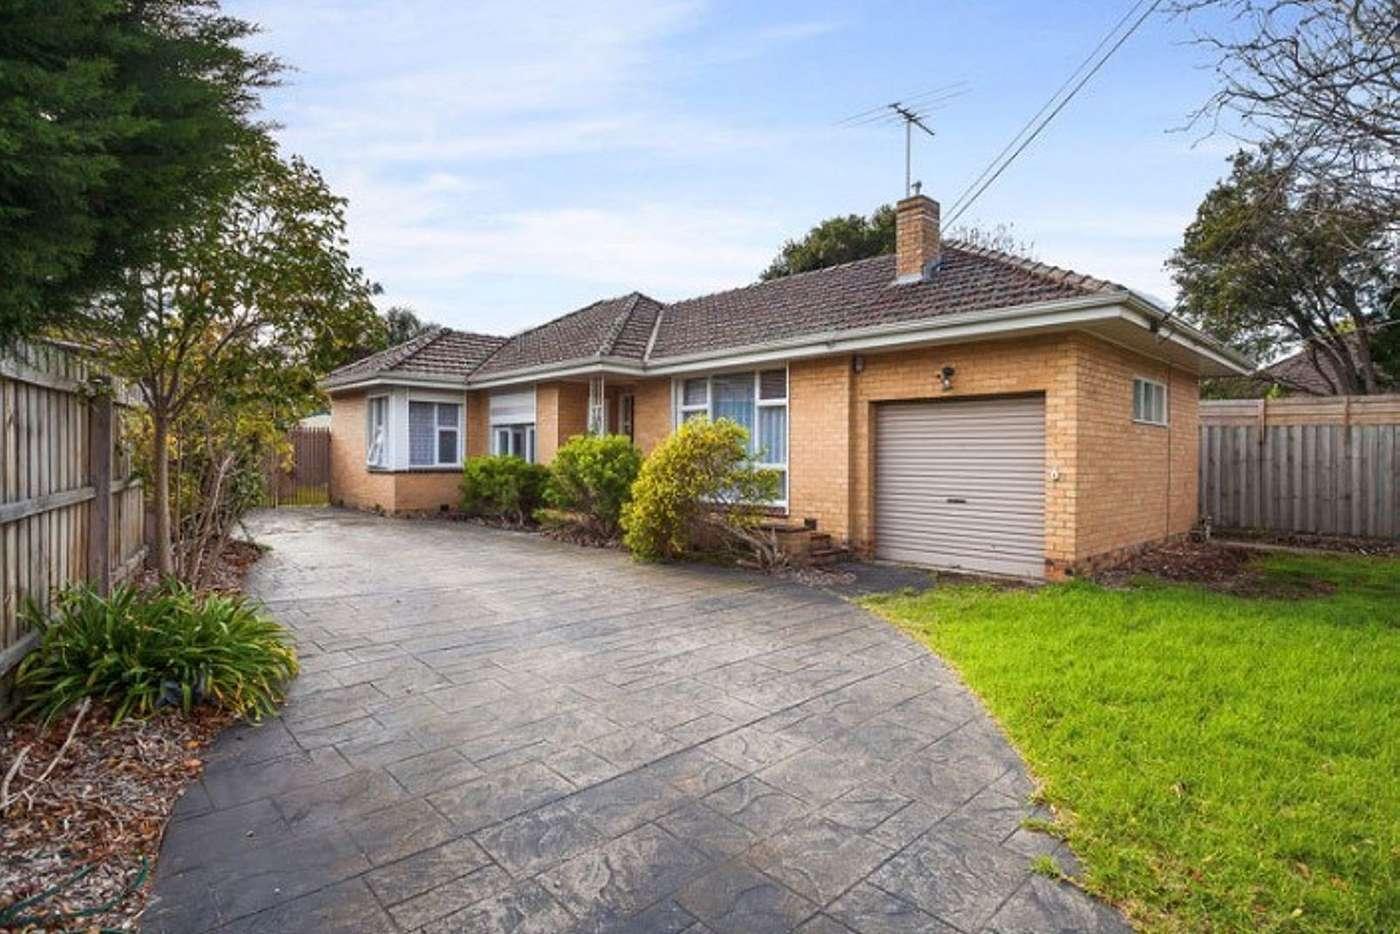 Main view of Homely house listing, 35 Booker Street, Cheltenham VIC 3192